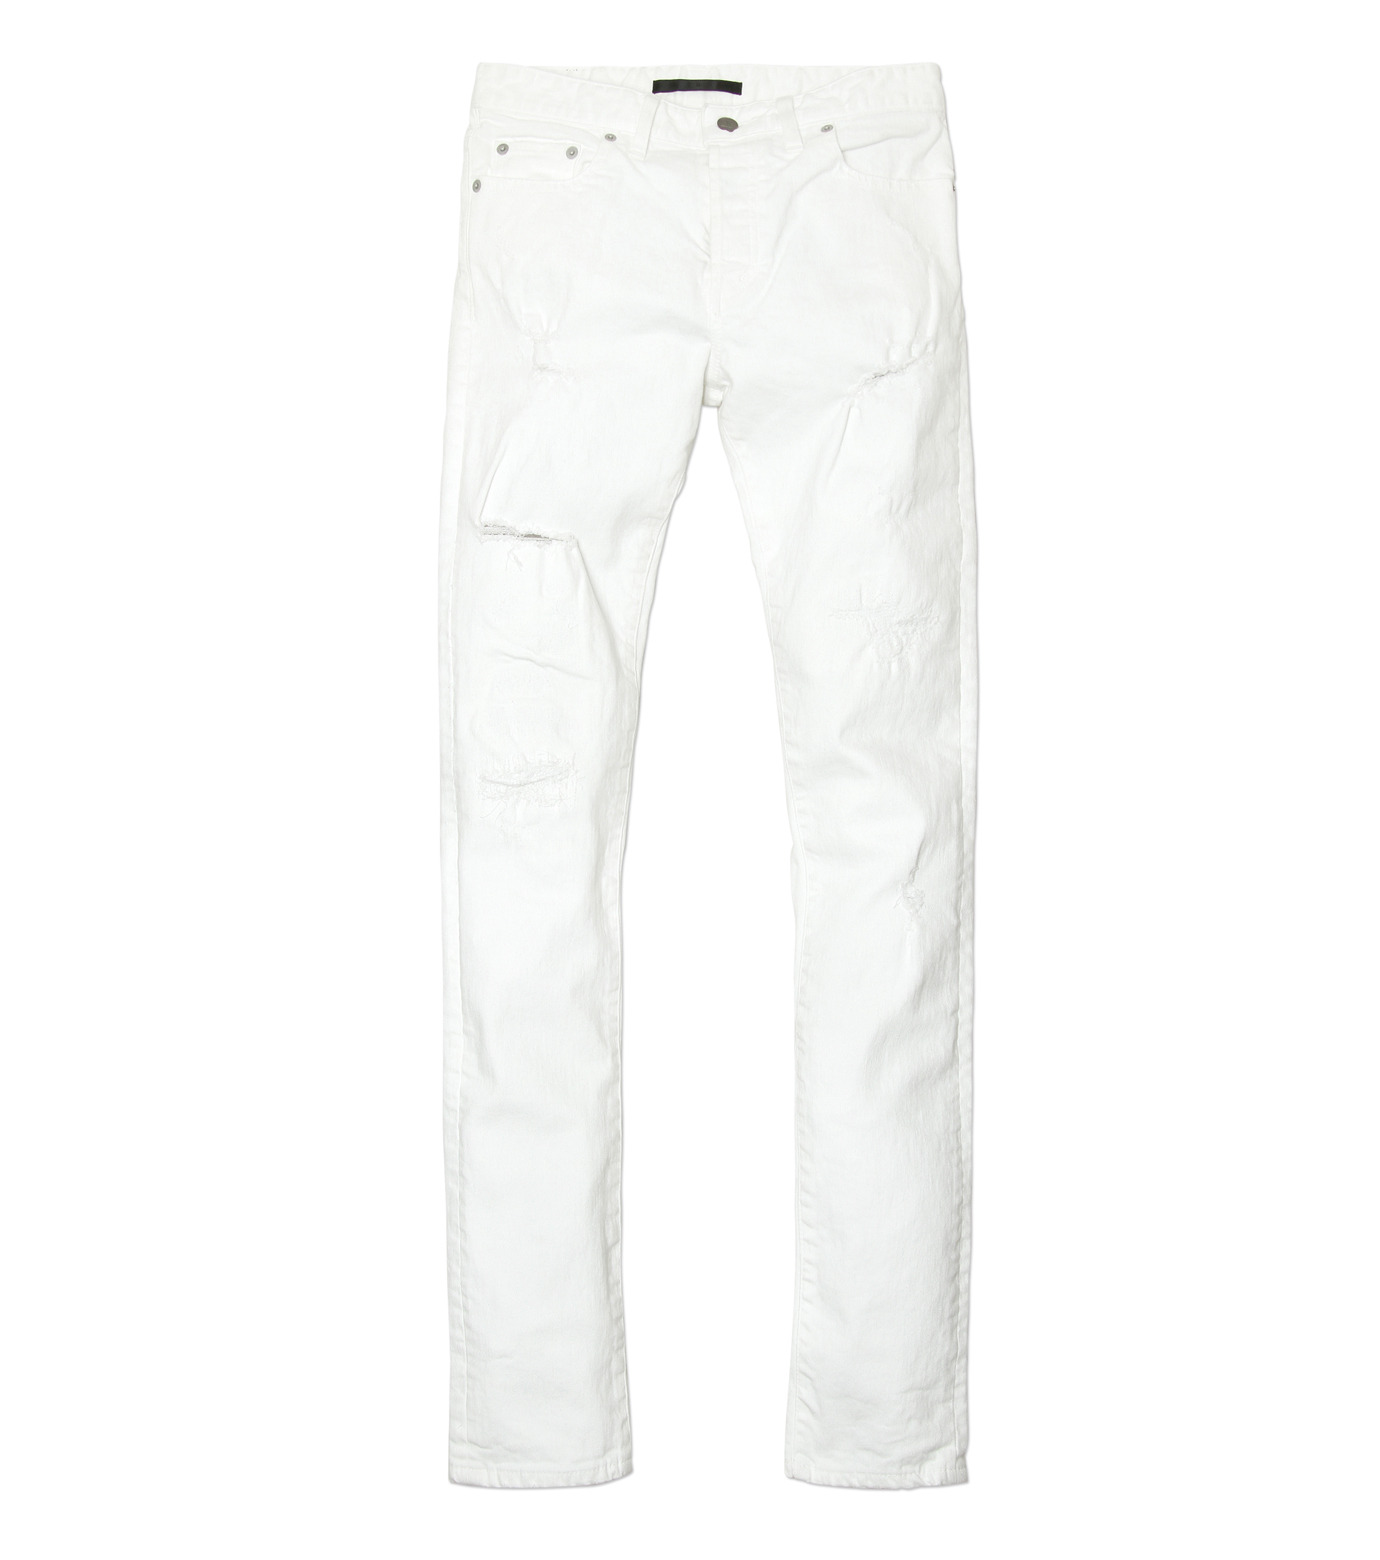 HL HEDDIE LOVU(エイチエル・エディールーヴ)のWhite Damage Denim-WHITE(パンツ/pants)-17S98002-4 拡大詳細画像5